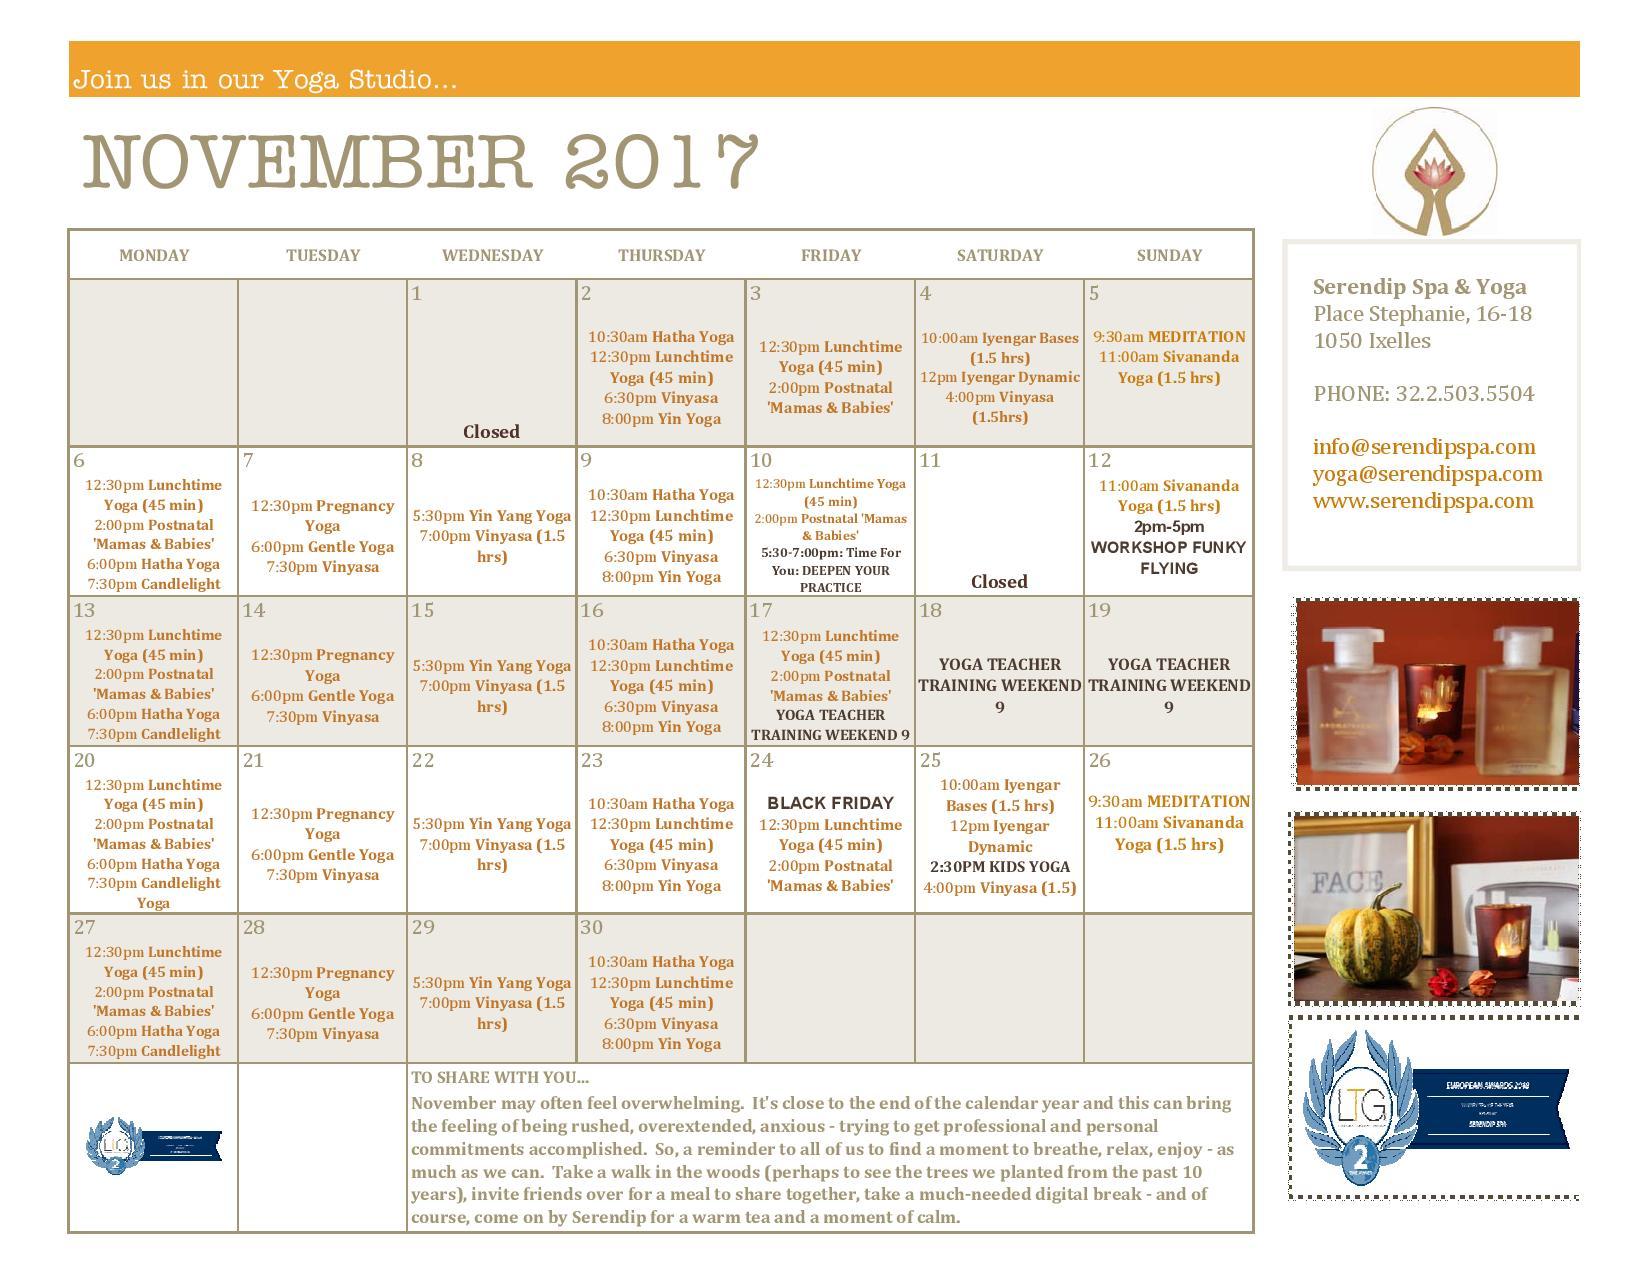 serendip spa and yoga calendar 2017_November A4 FRONT-page-001.jpg